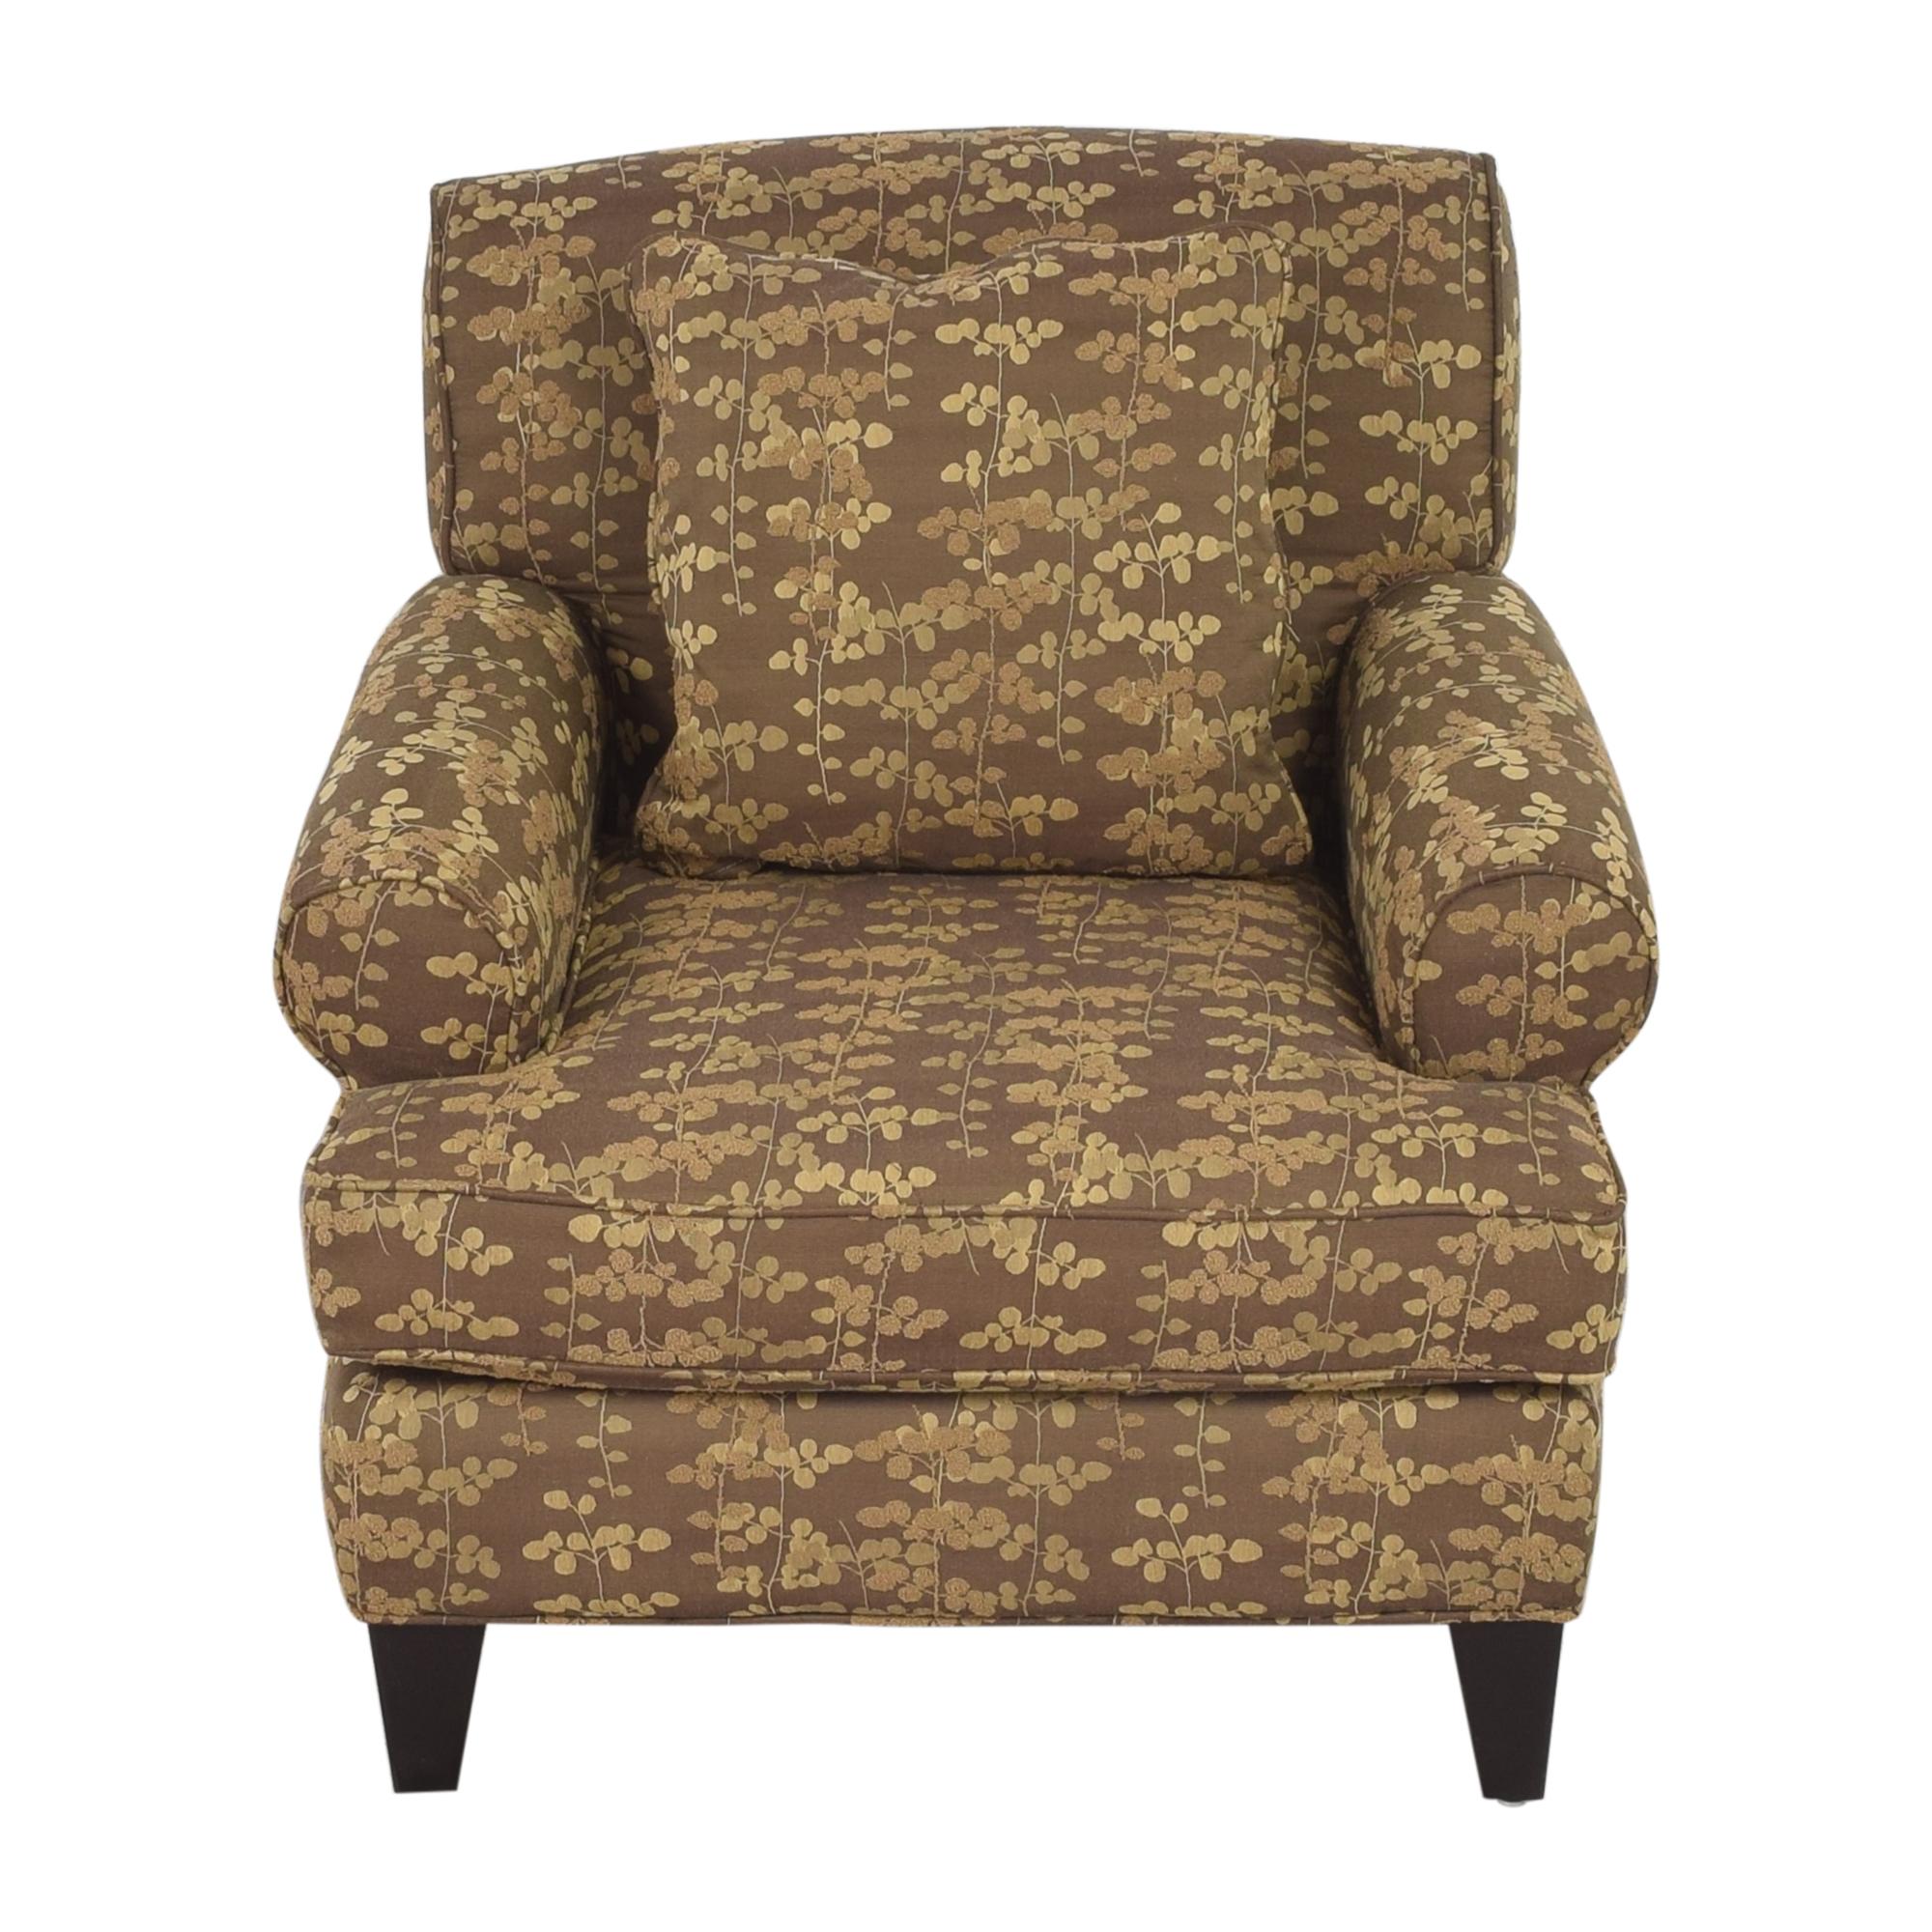 Macy's Macy's Roll Arm Club Chair Chairs